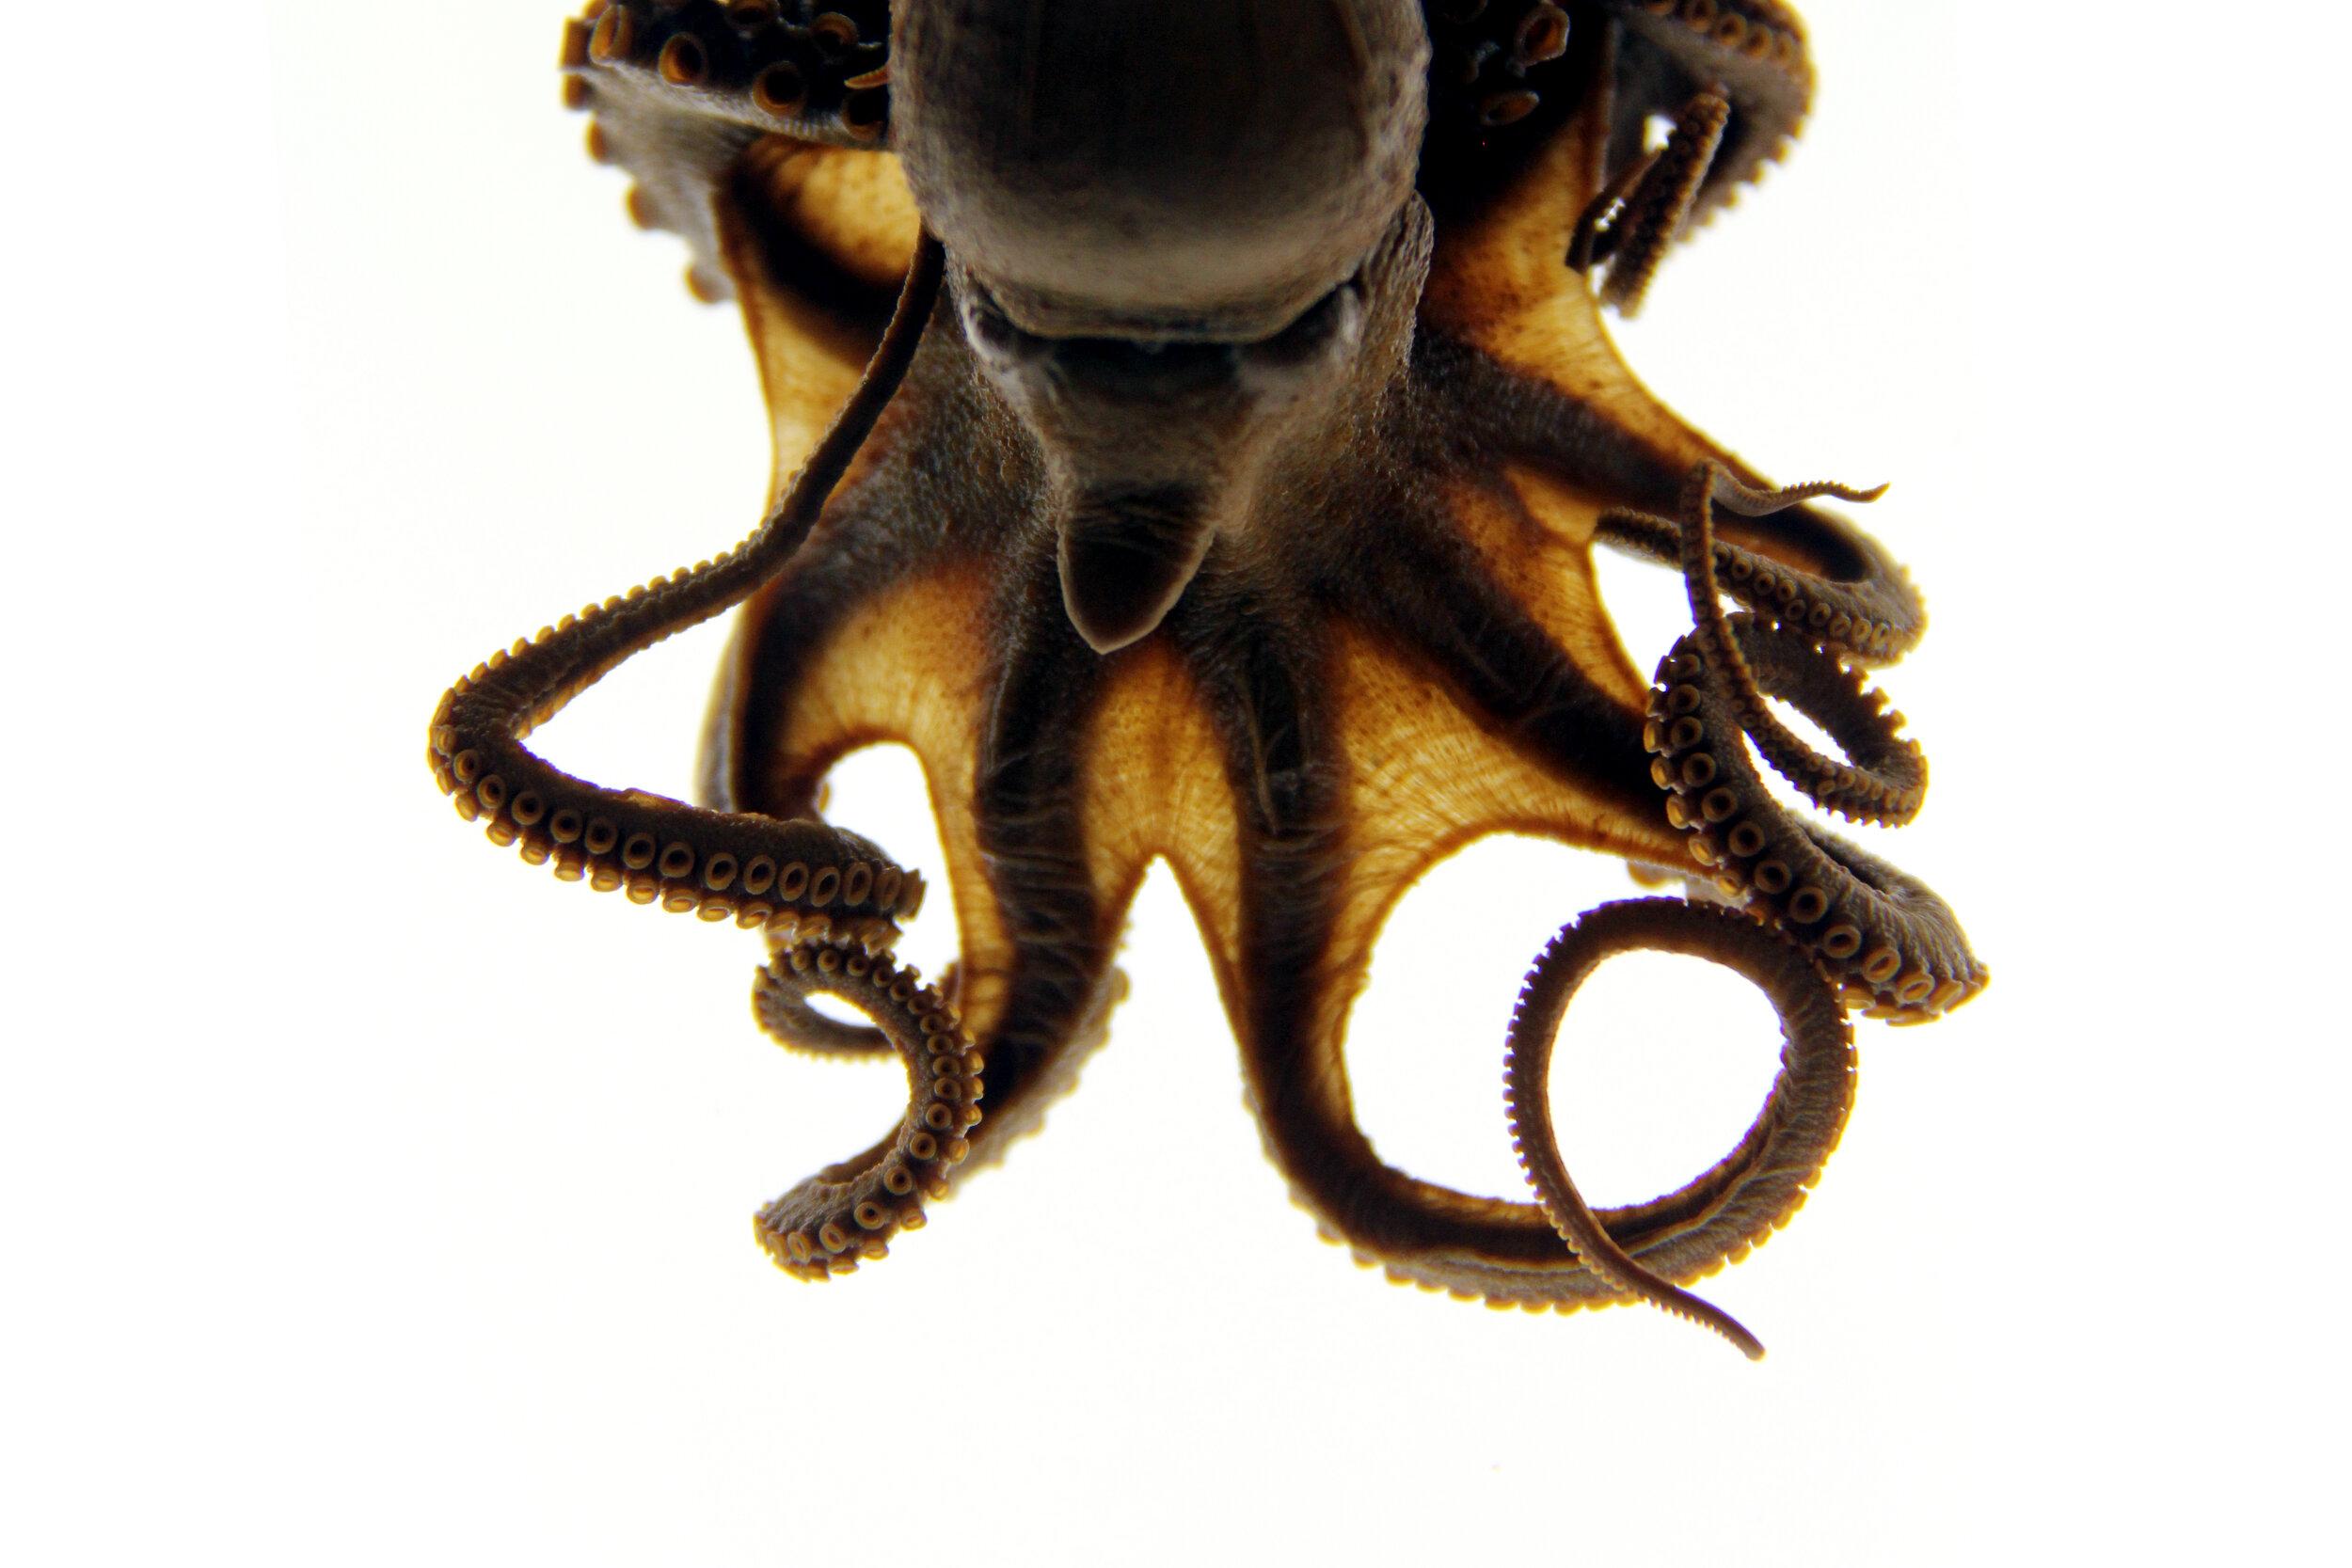 018_Poindexter_Octopus sp M 8672 IMG_3342 edit.jpg